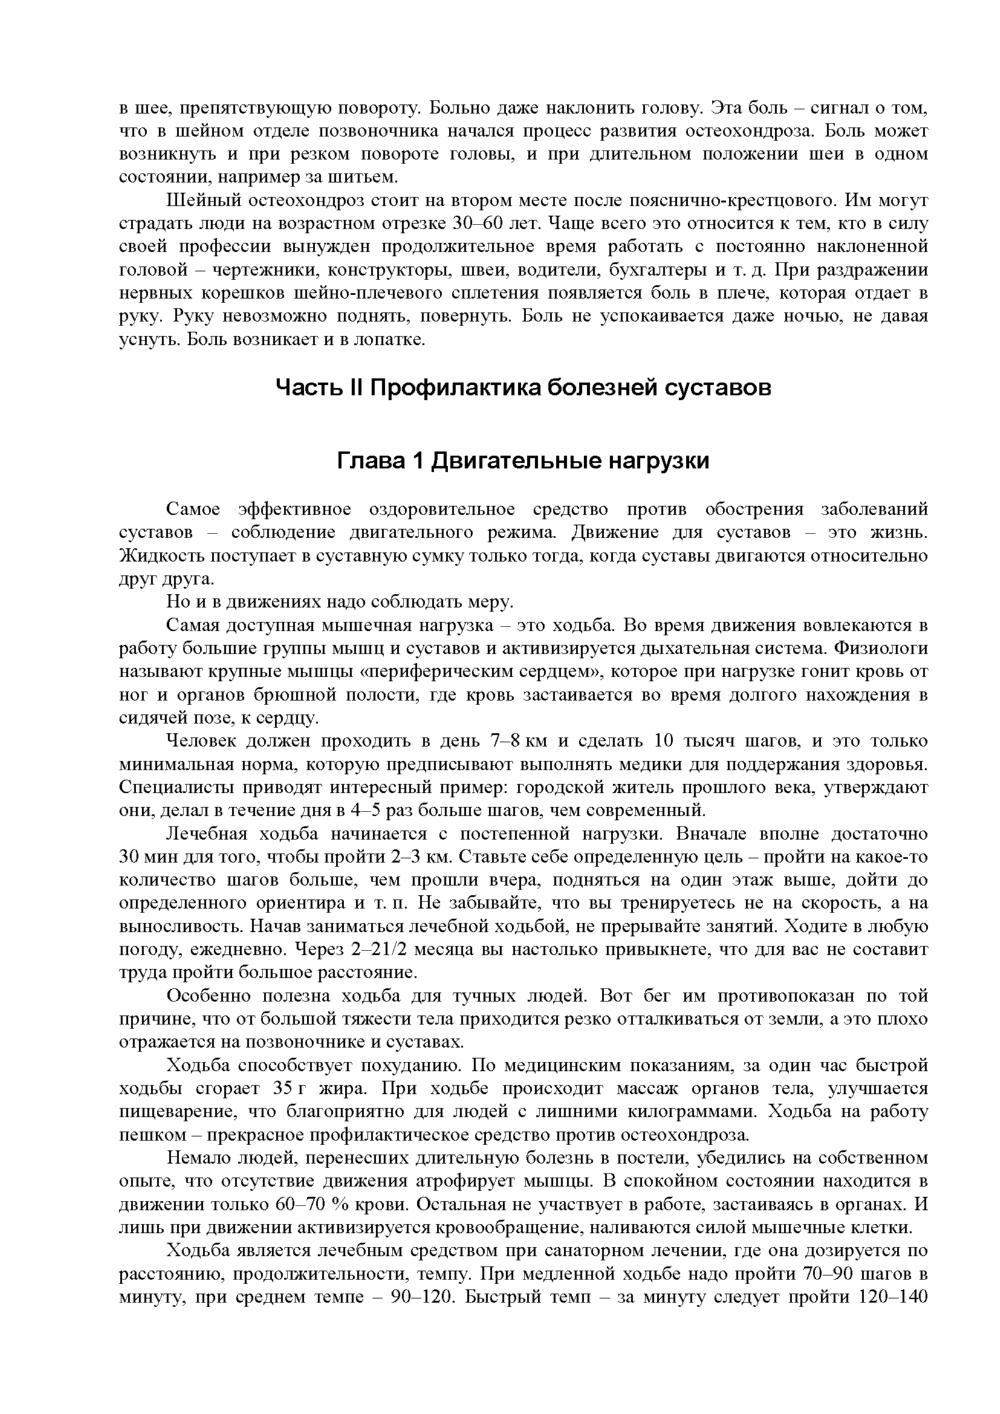 http://i2.imageban.ru/out/2013/12/03/c1a2a71ab5a58de77b5859311eb3732e.jpg